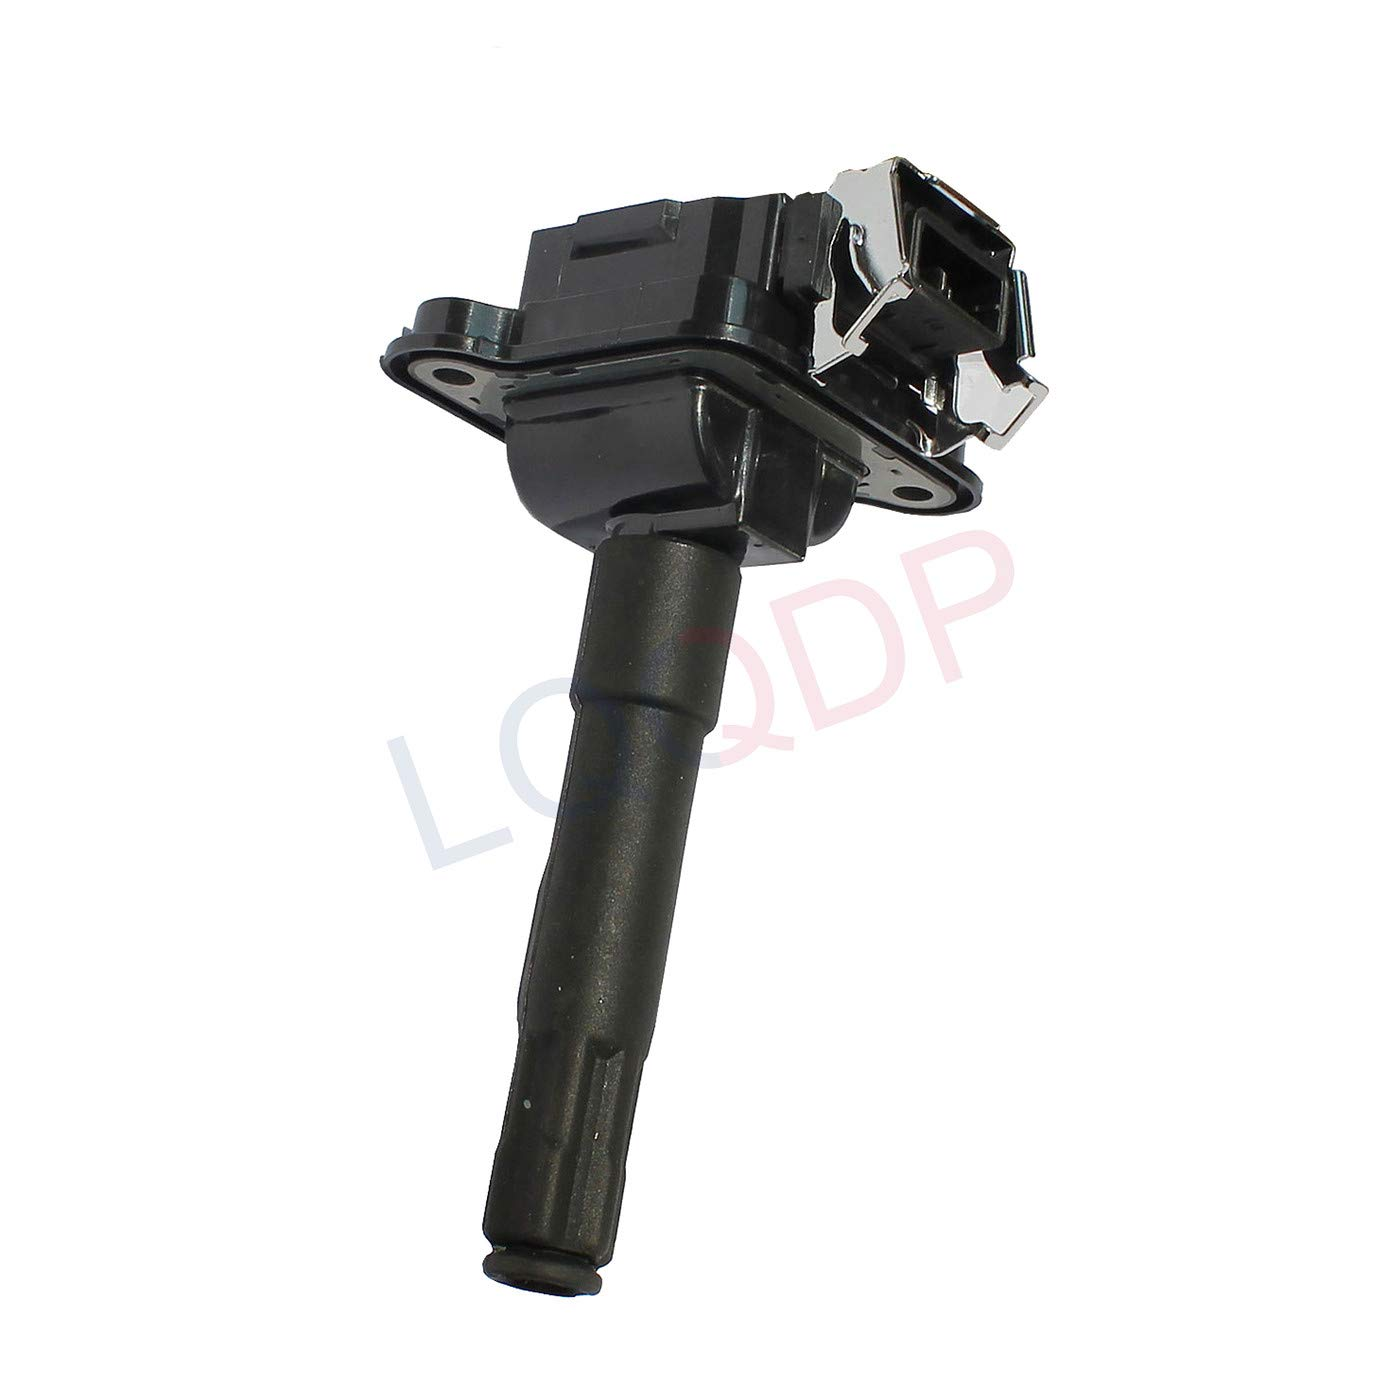 LQQDP Pack of 6 New Ignition Coil For Audi A4 A6 A8 Quattro S4 Volkswagen Passat 1.8L L4 2.7L V6 Turbo 3.7L 4.2L V8 Compatible with UF290 E704